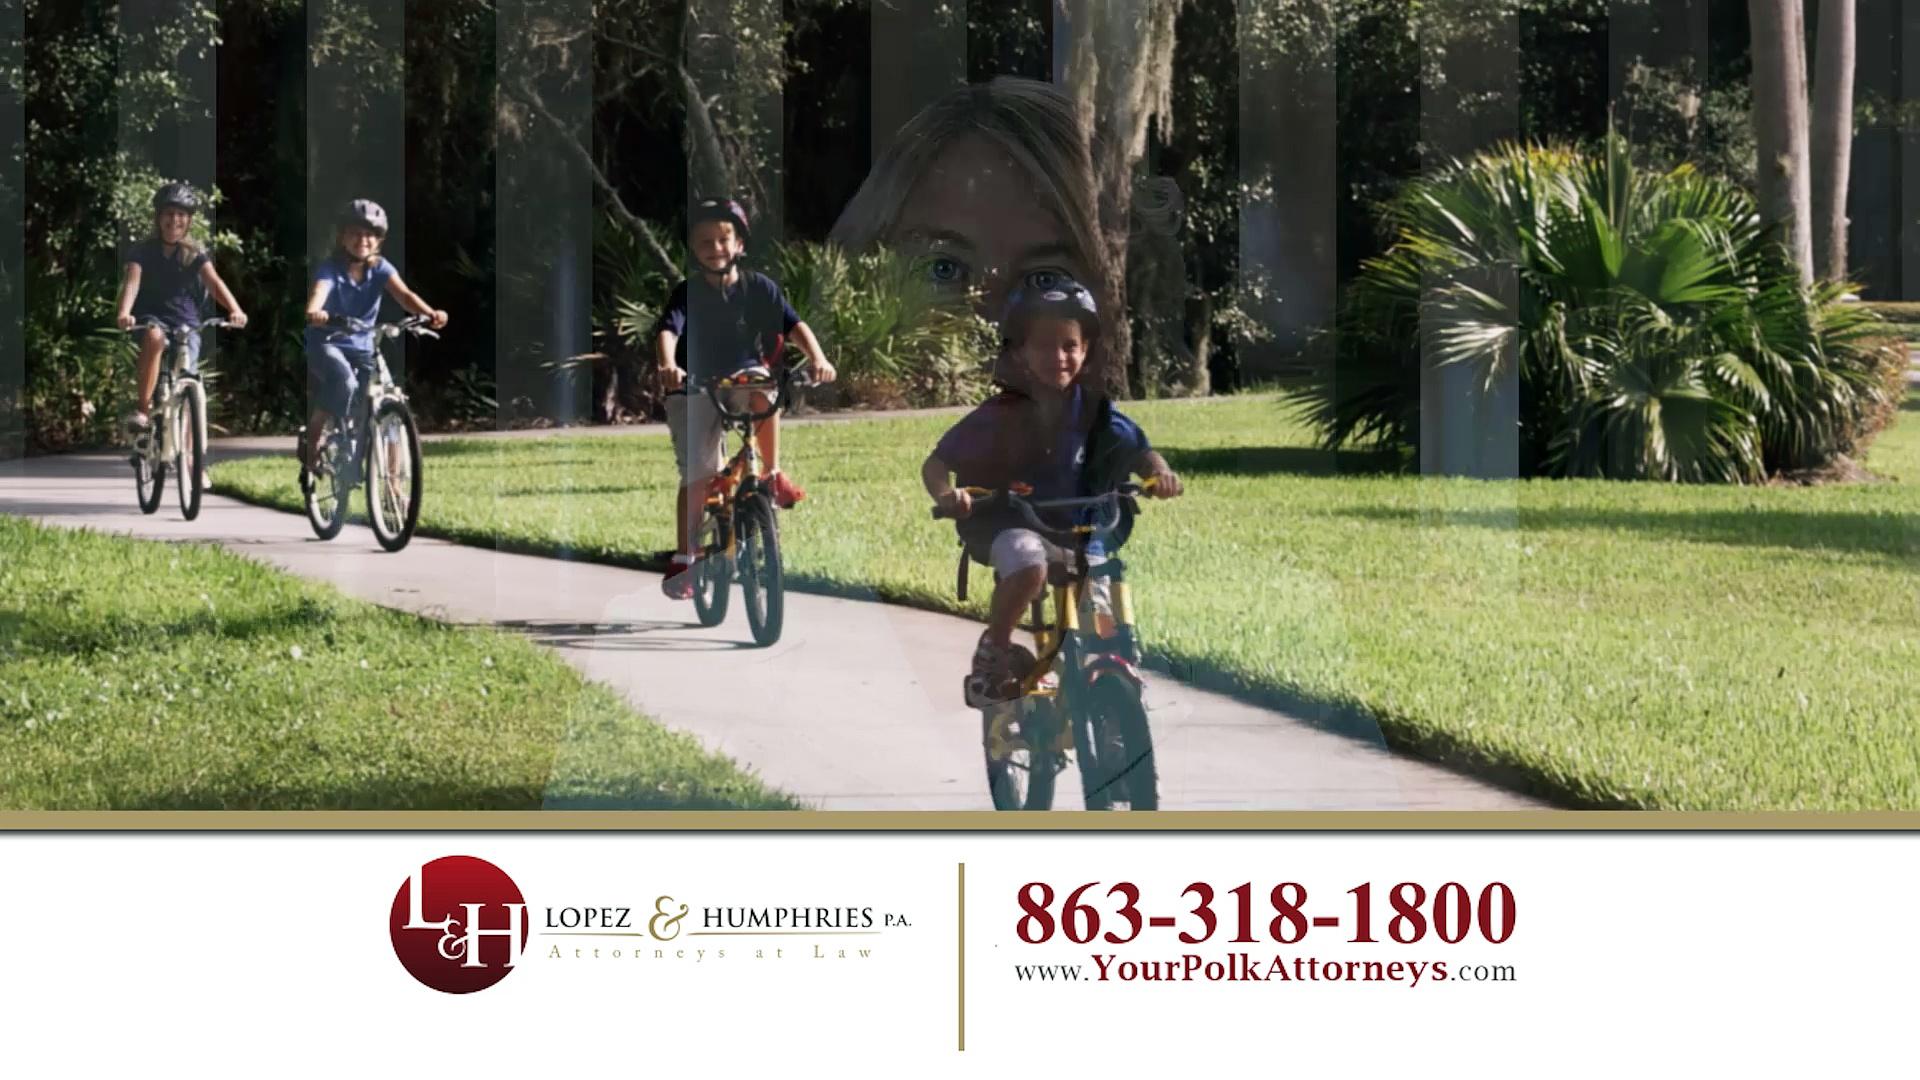 Auto Accidents | Personal Injury Attorneys Polk County FL Lakeland FL http://www.YourPolkAttorneys.com